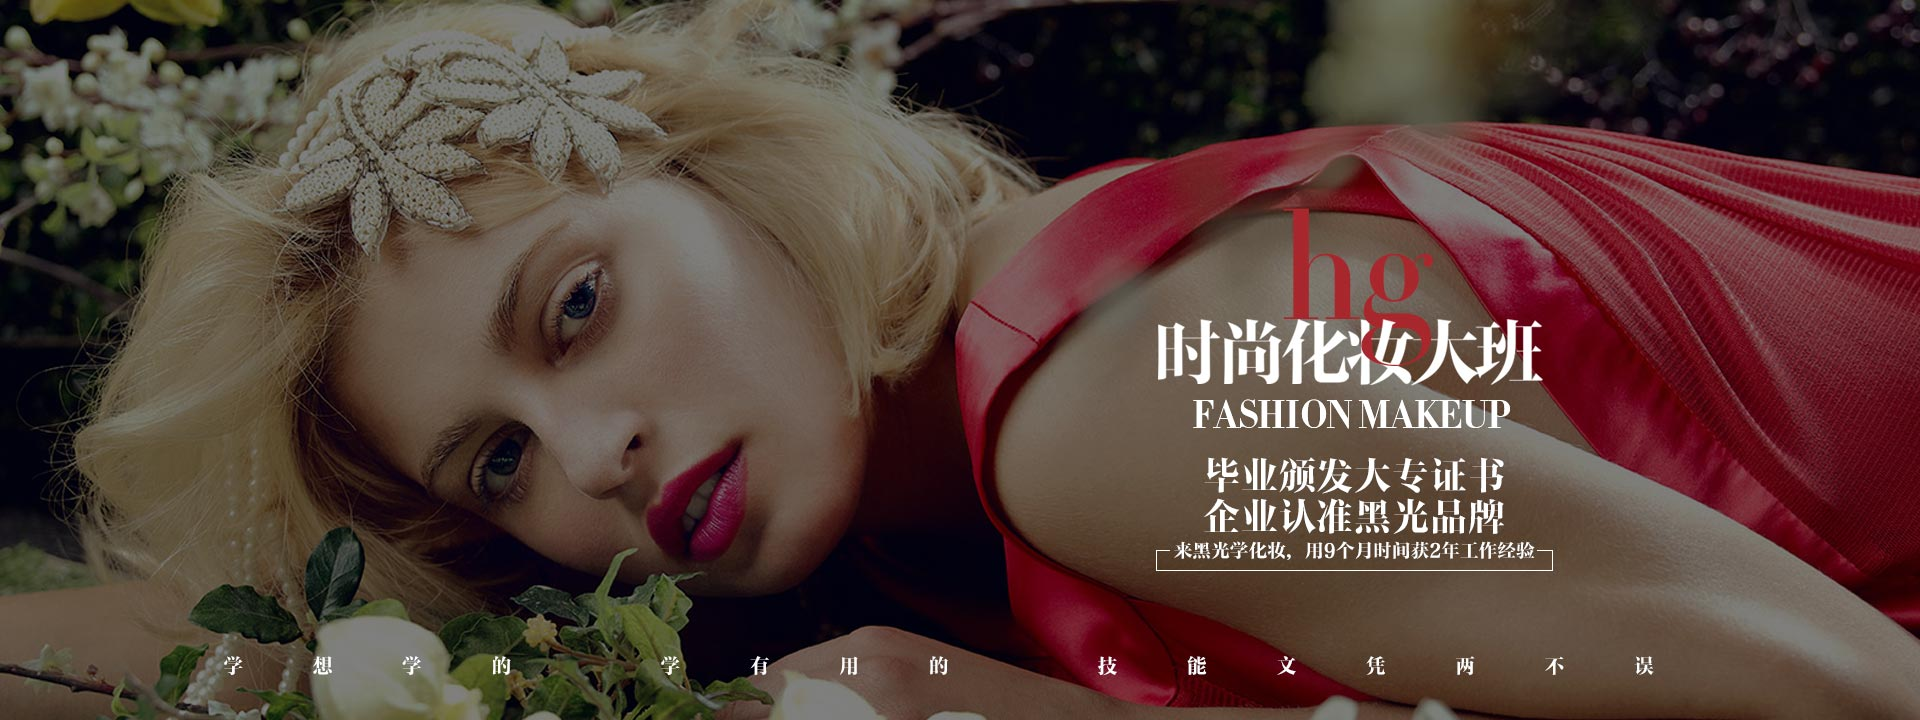 时尚化妆大专班banner